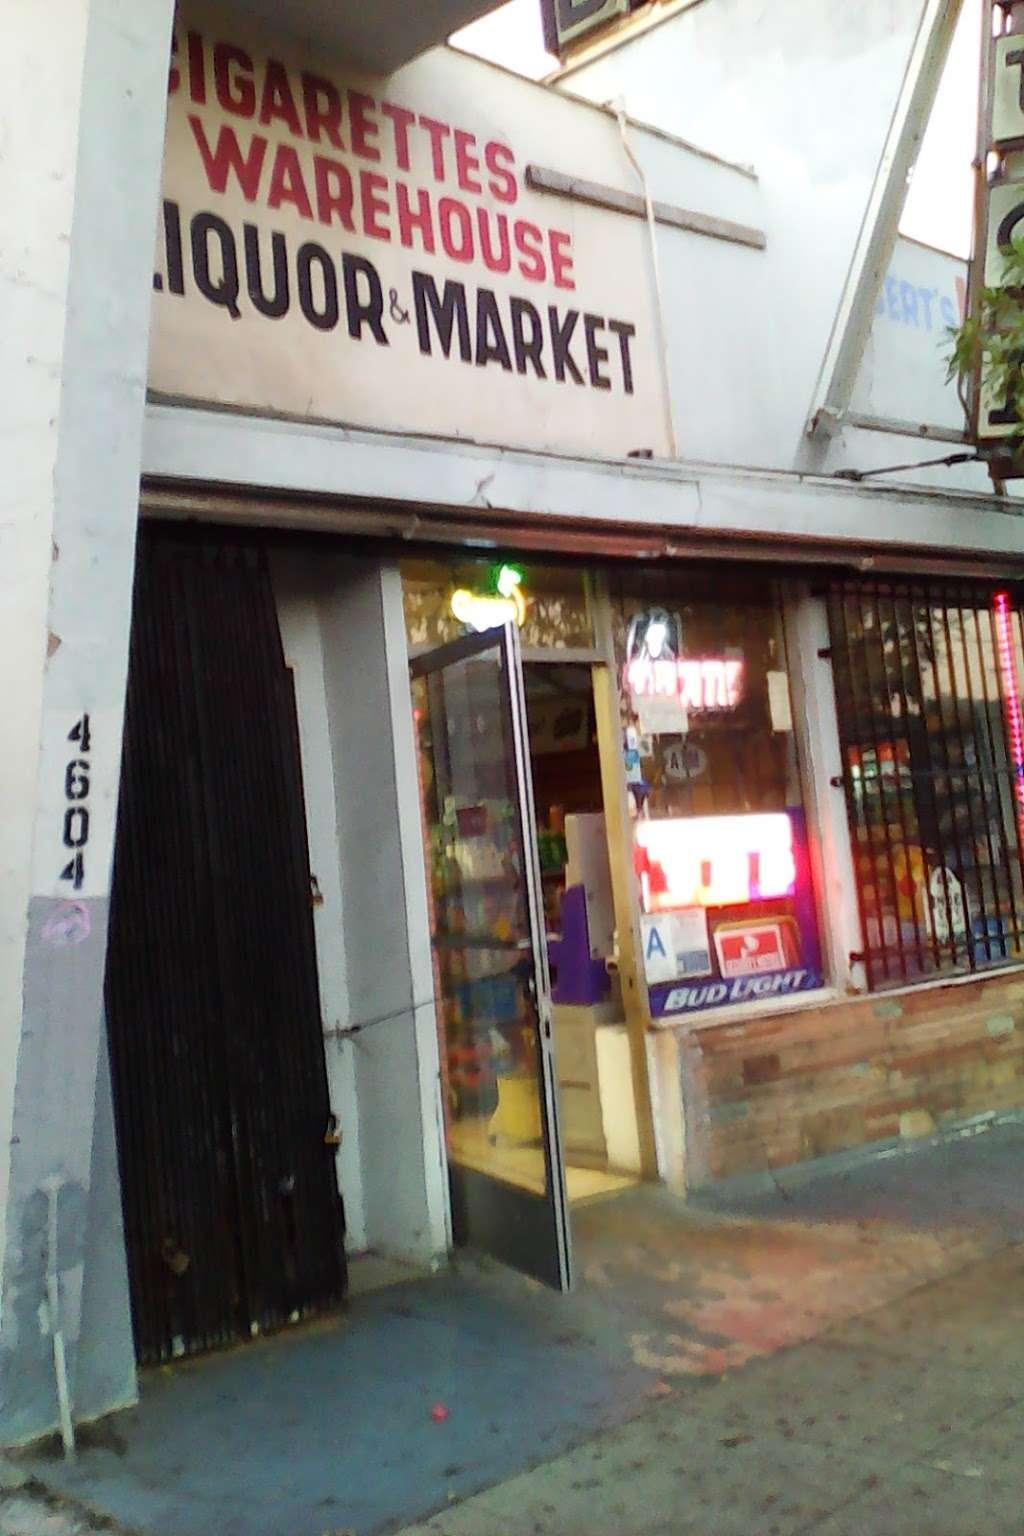 Berts Liquor Store - store    Photo 2 of 2   Address: 4604 York Blvd, Los Angeles, CA 90041, USA   Phone: (323) 255-5256